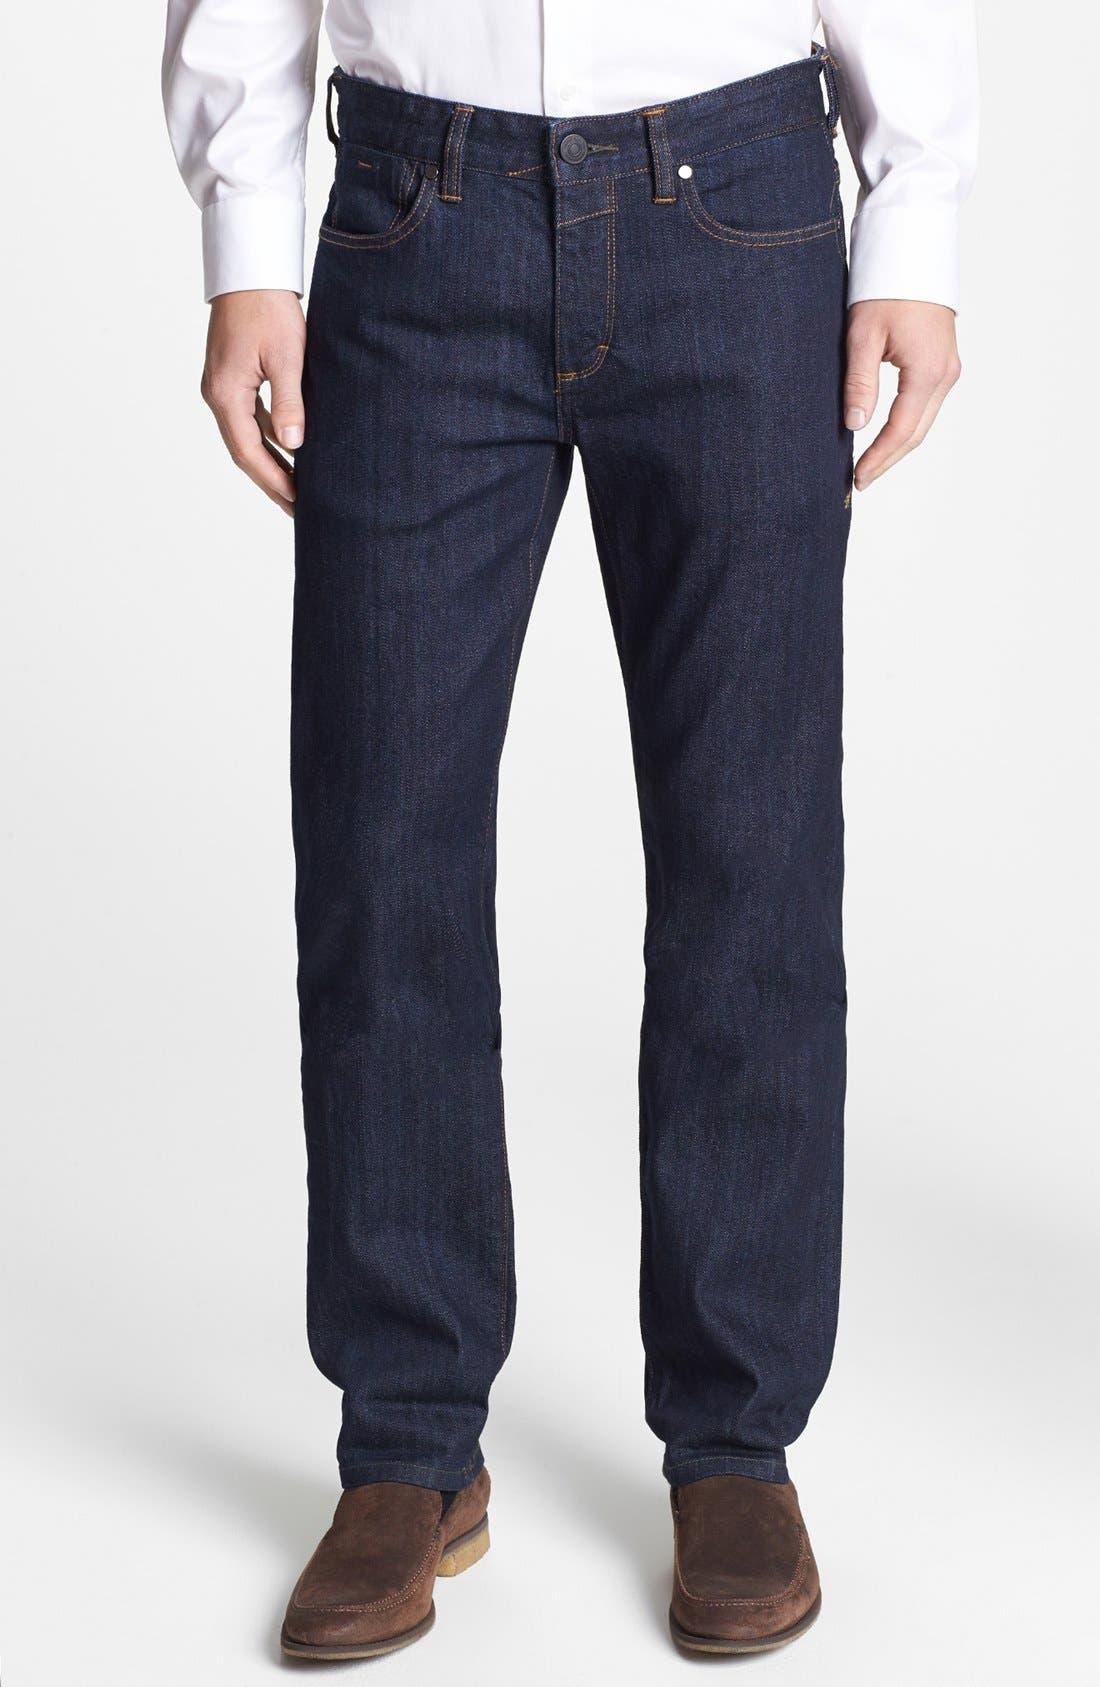 Alternate Image 1 Selected - Tommy Bahama 'Walker' Straight Leg Jeans (Dark Storm)